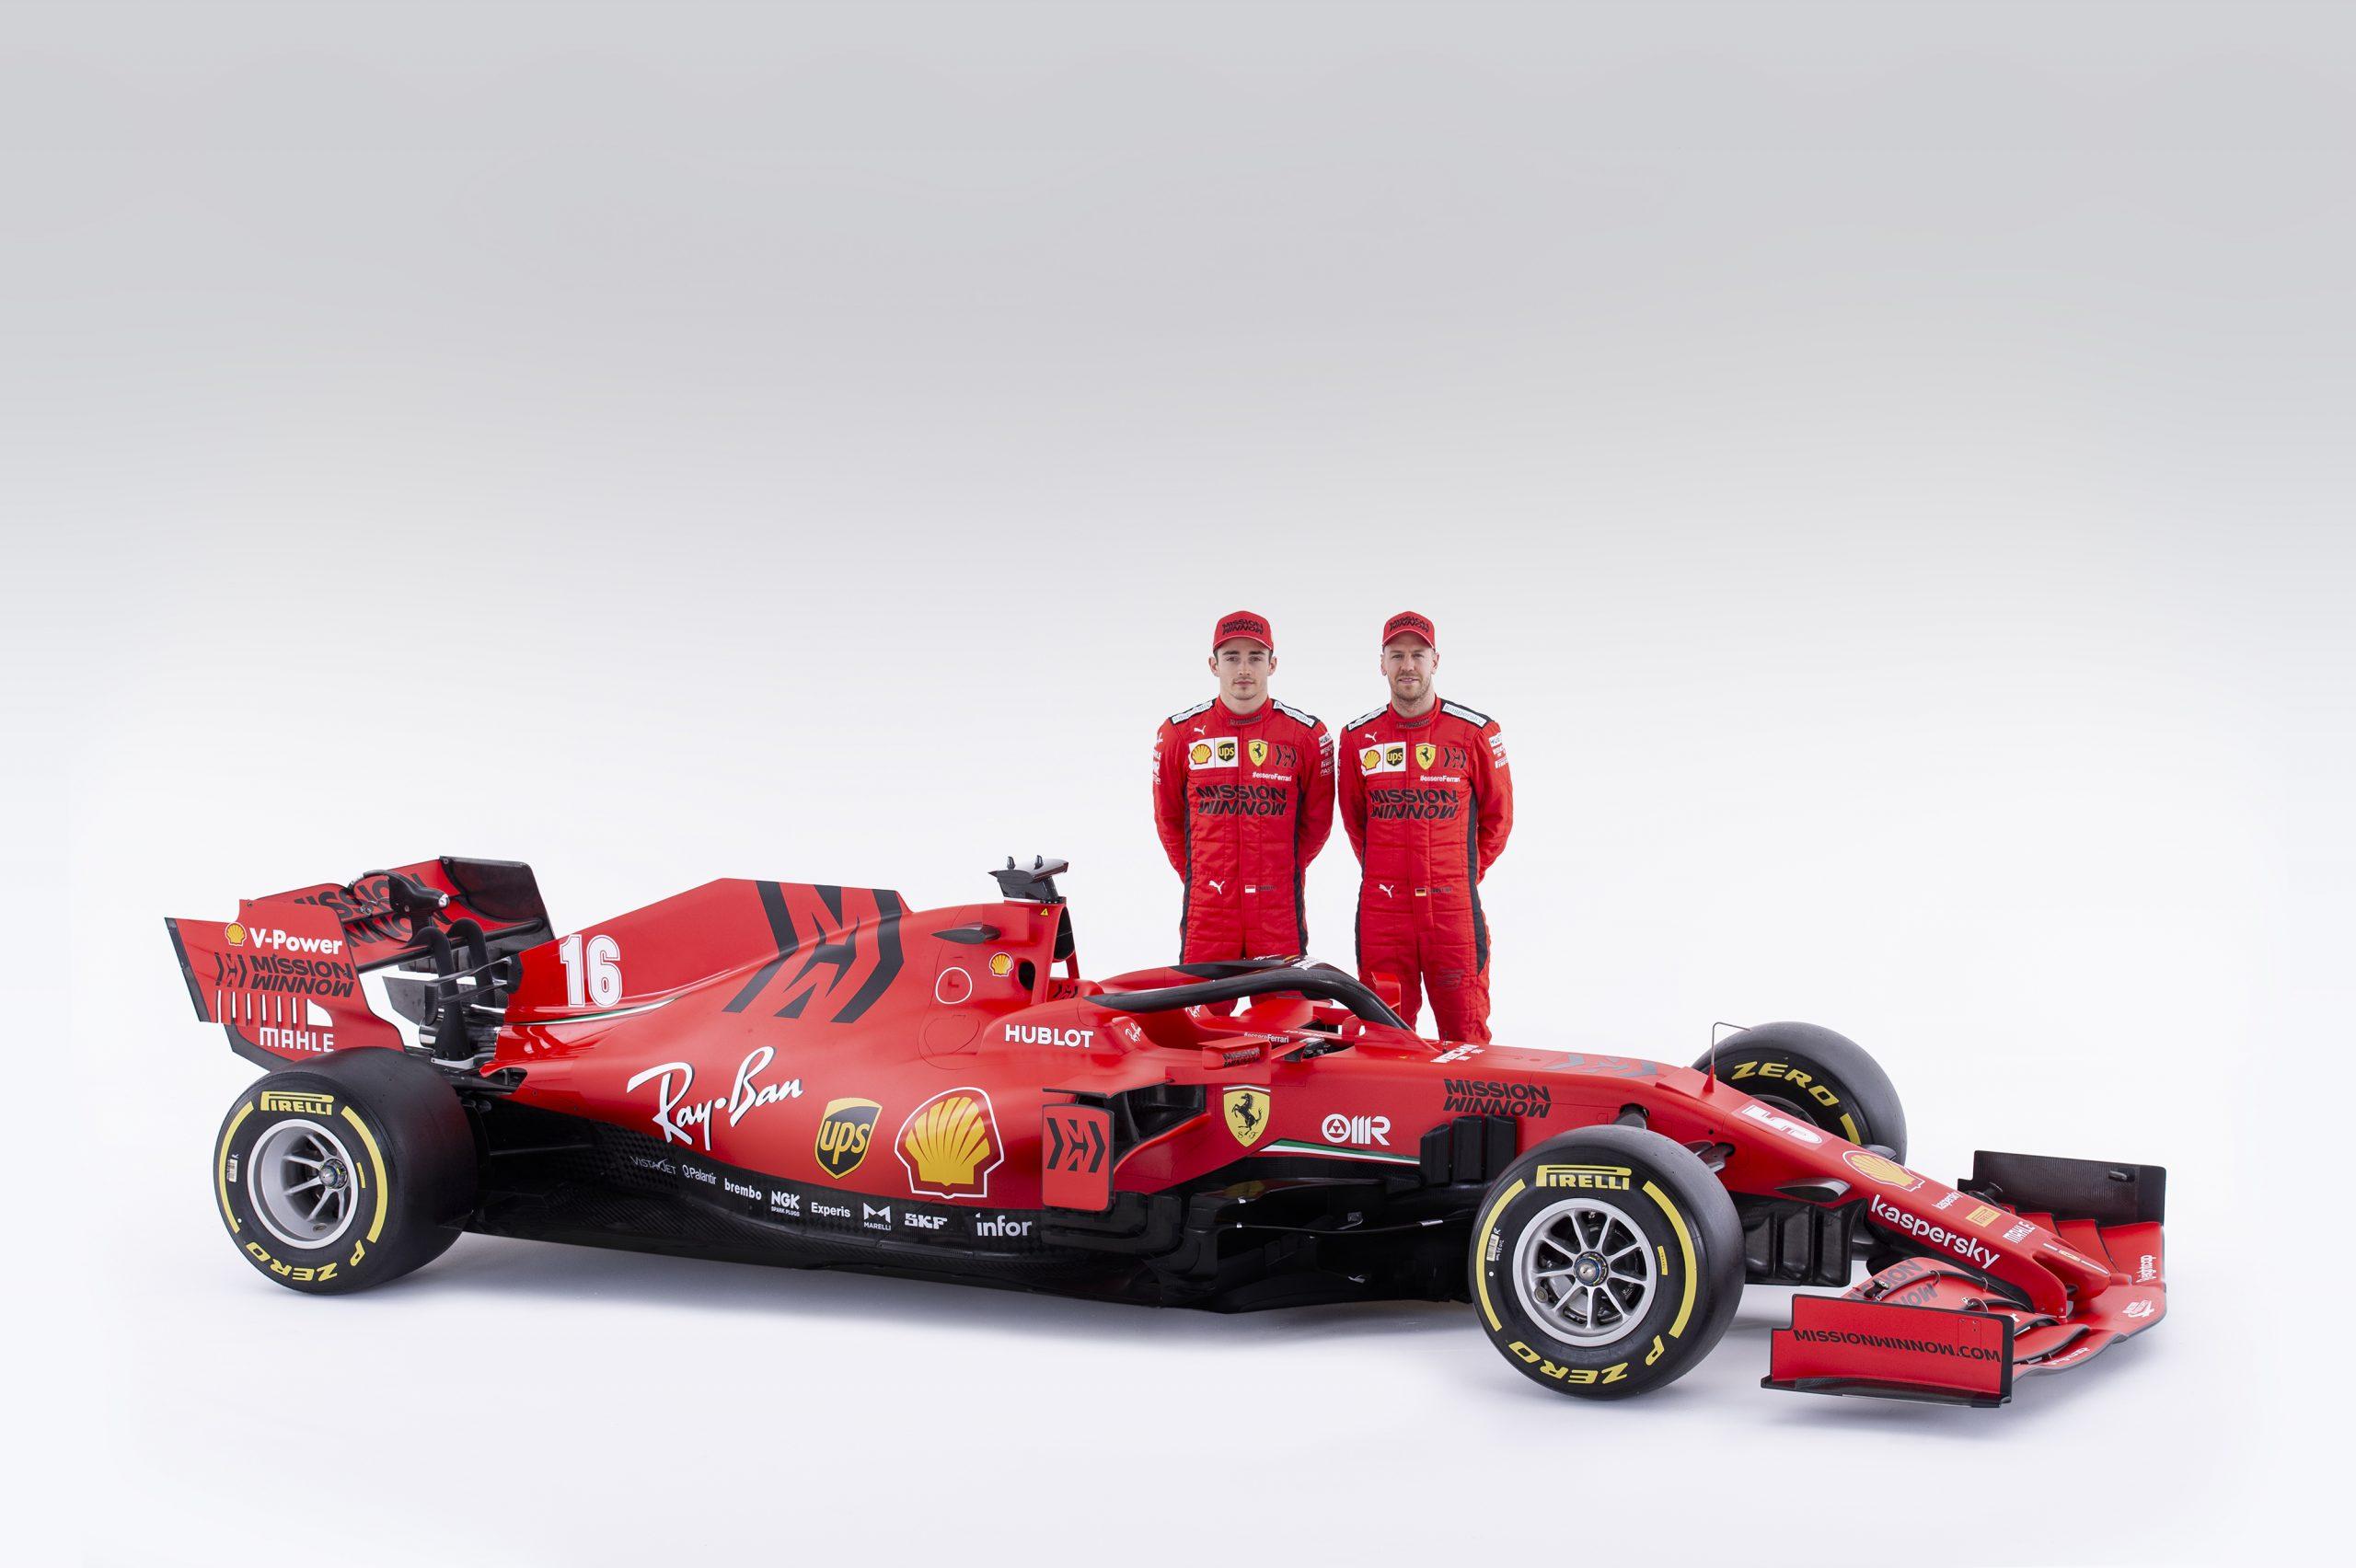 F1 - Vettel sera le premier en piste avec la Ferrari SF1000 à Barcelone